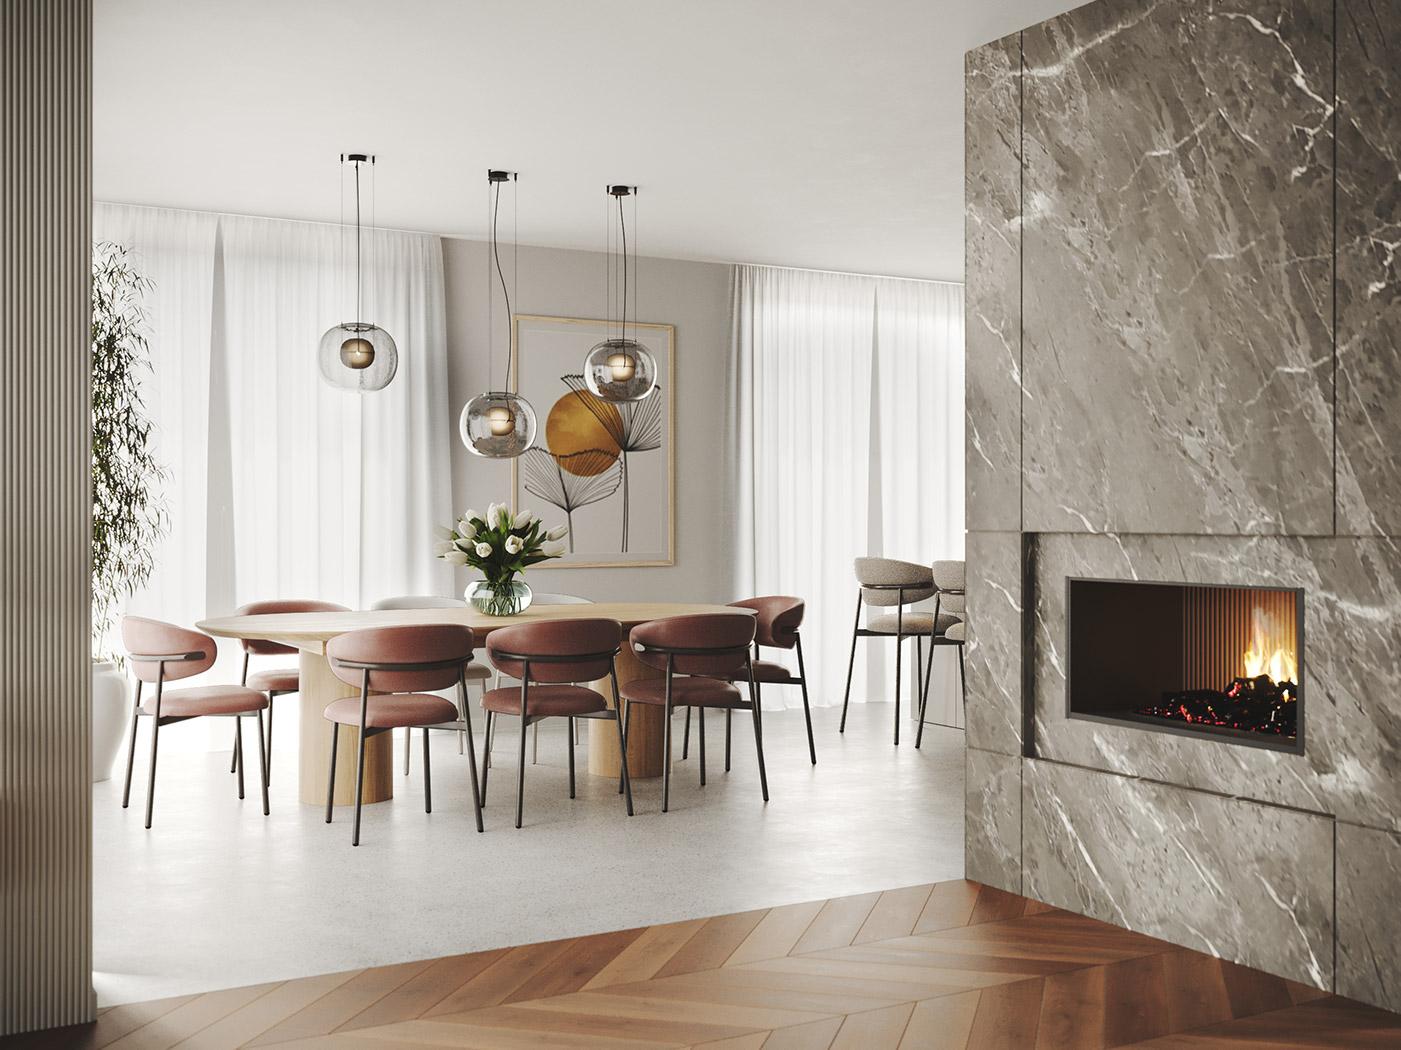 Elegant harmony, House interior design | Dining room